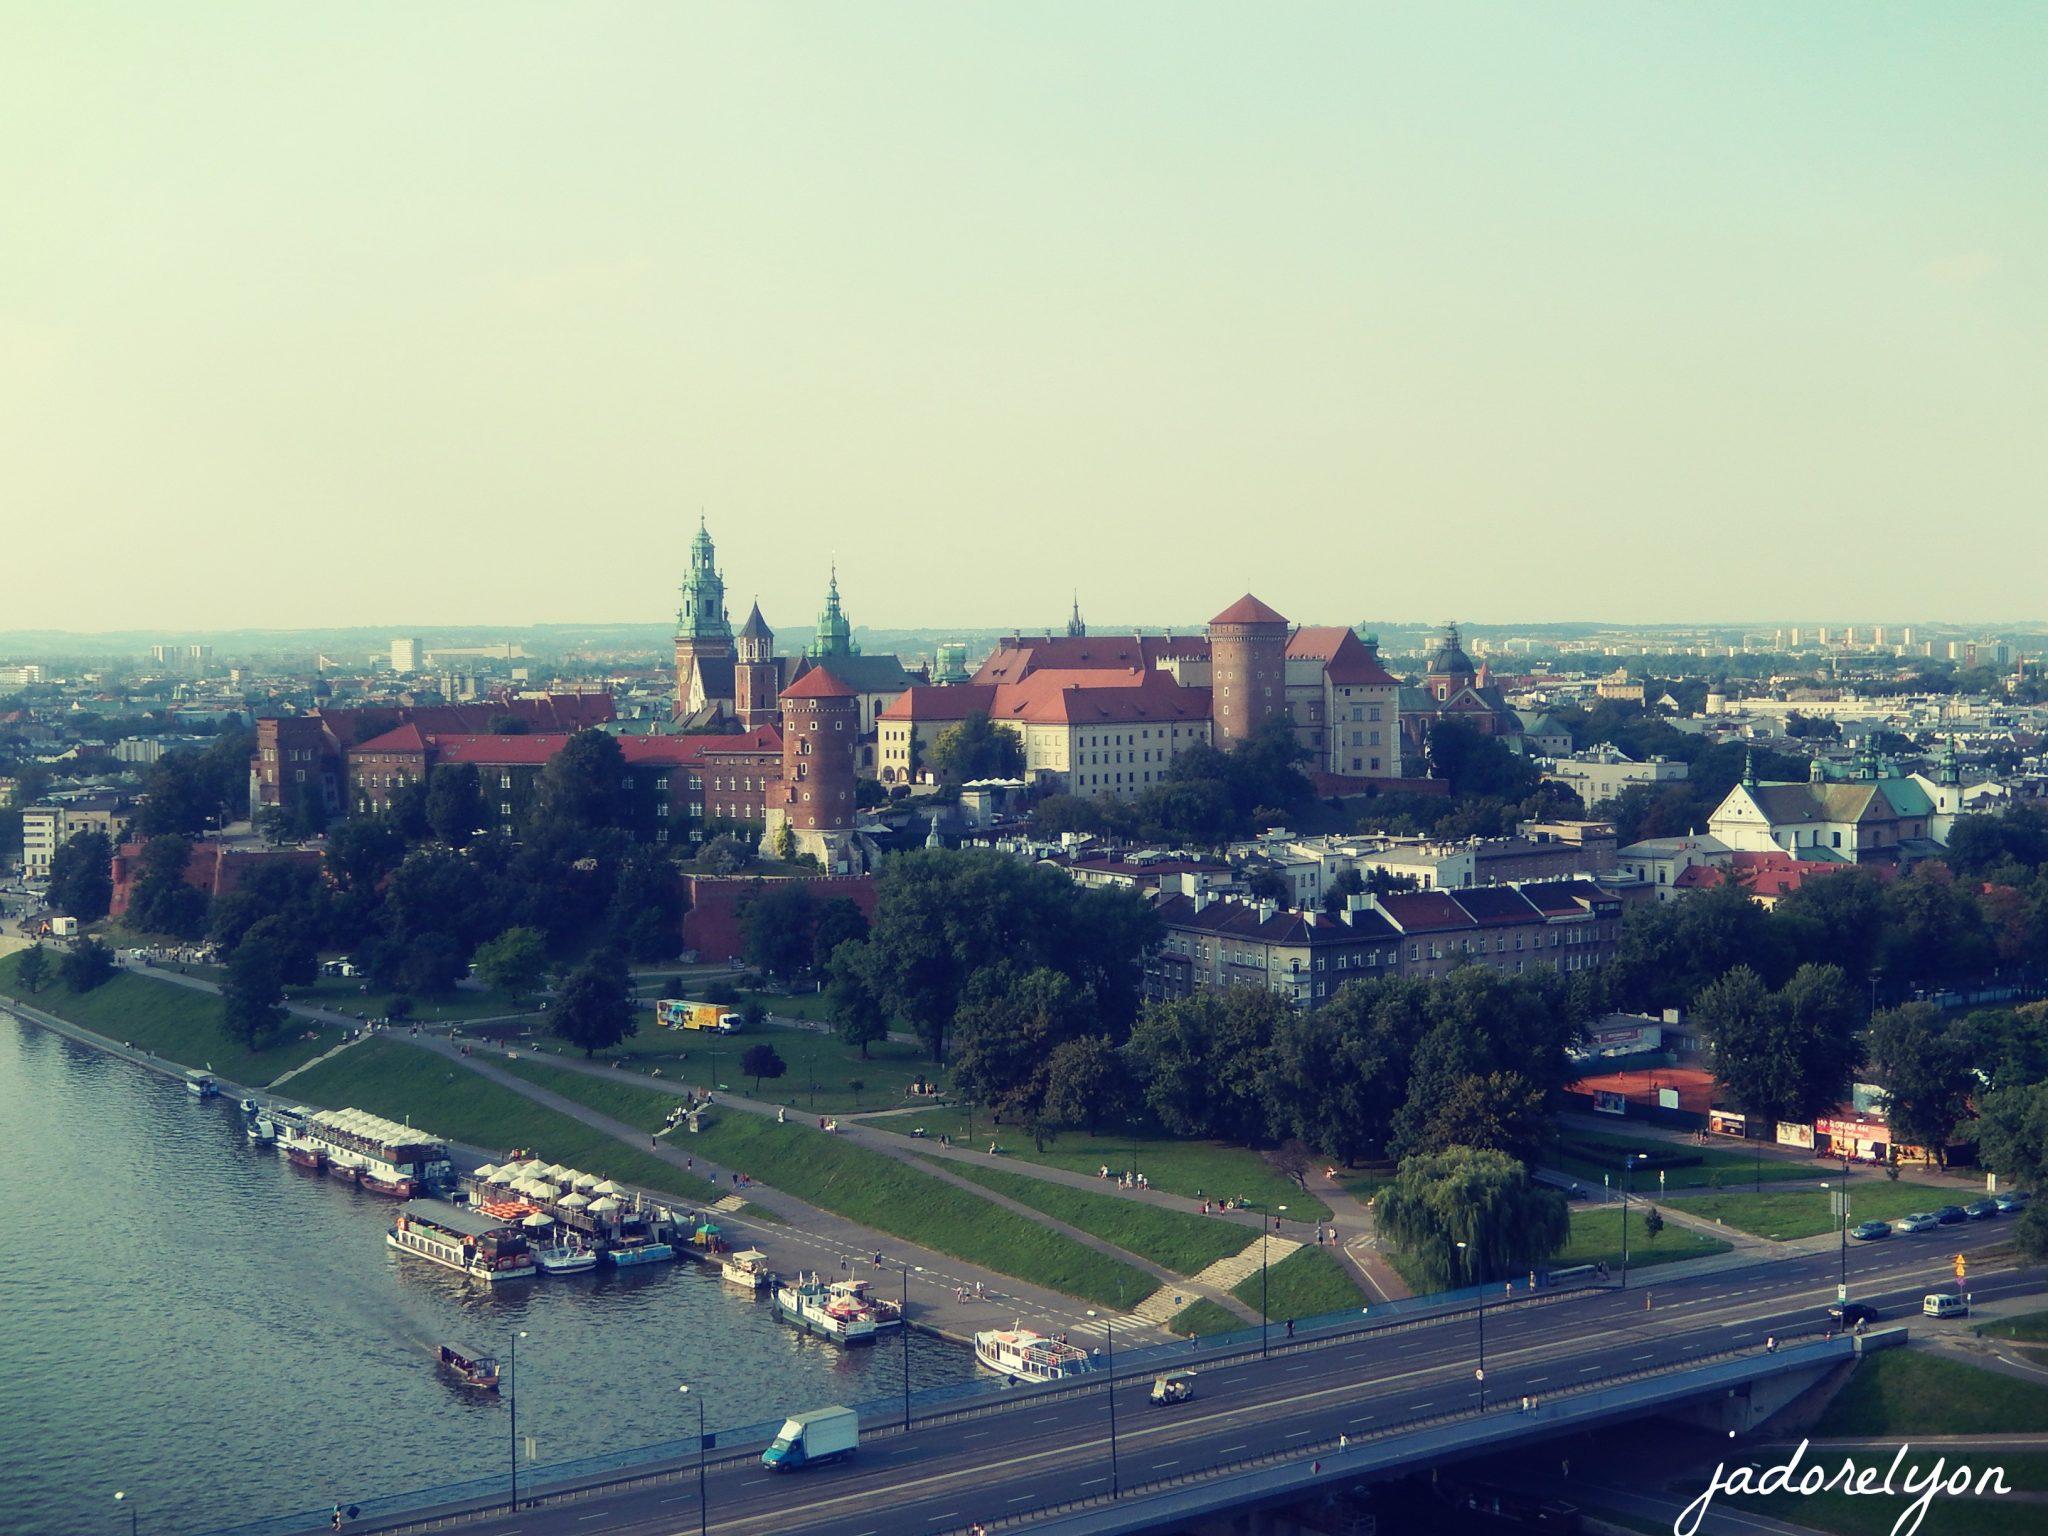 Krakow - the previous capital of Poland